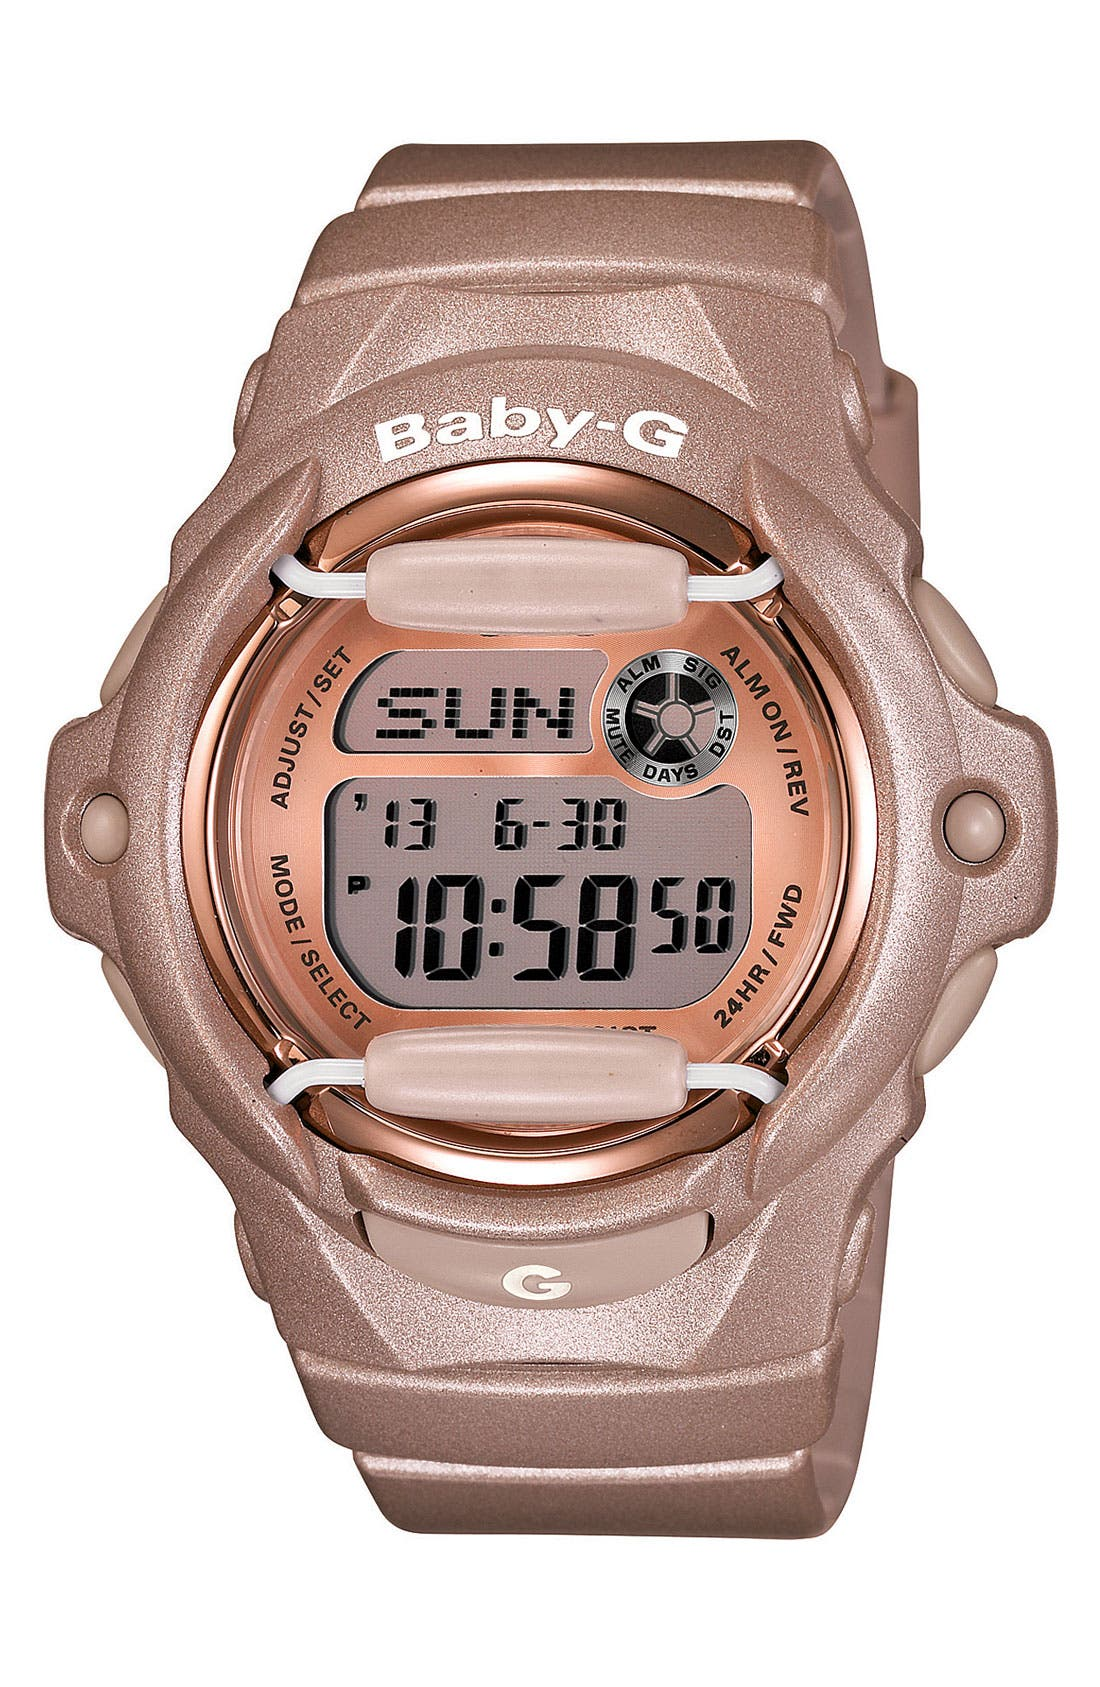 G-SHOCK BABY-G Baby-G Pink Dial Digital Watch, 46mm x 42mm